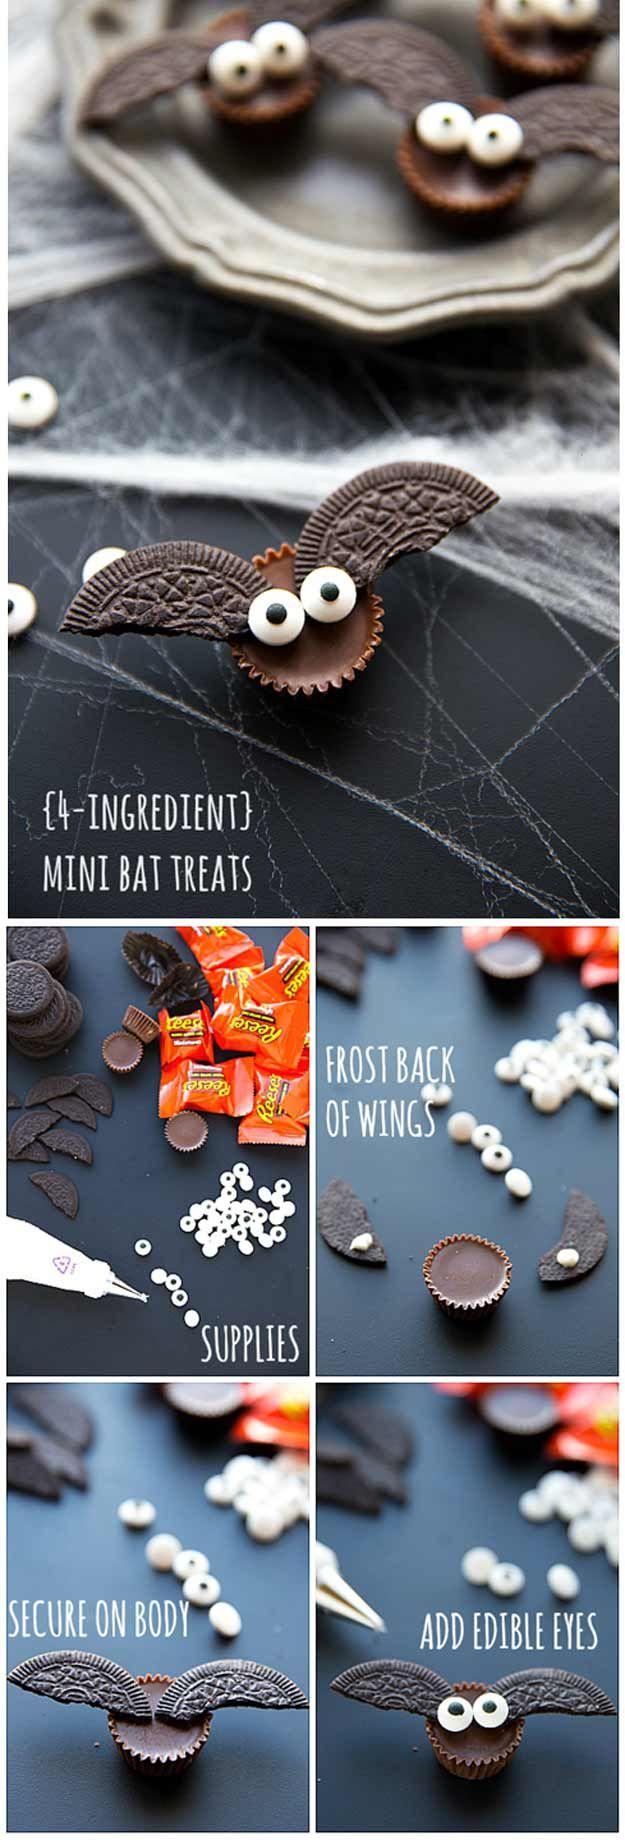 21 Spooky Halloween Dessert Ideas